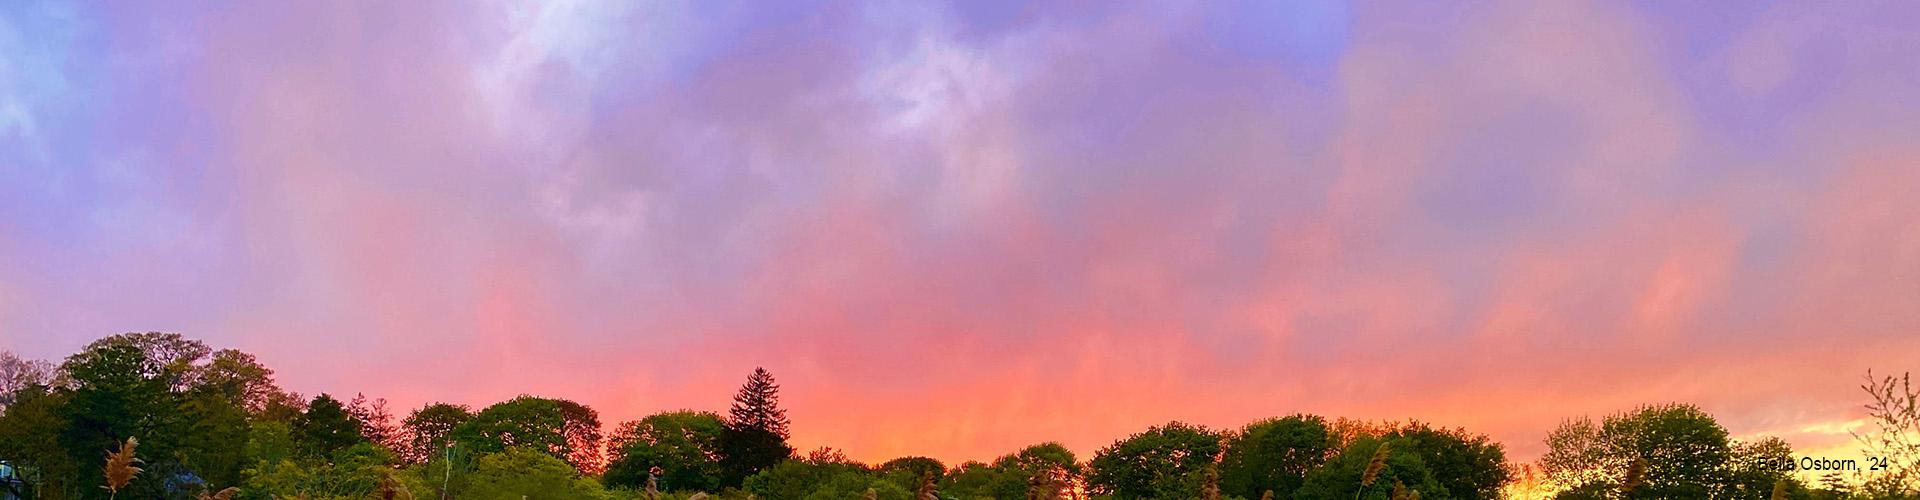 Bella Osborn – Sunset